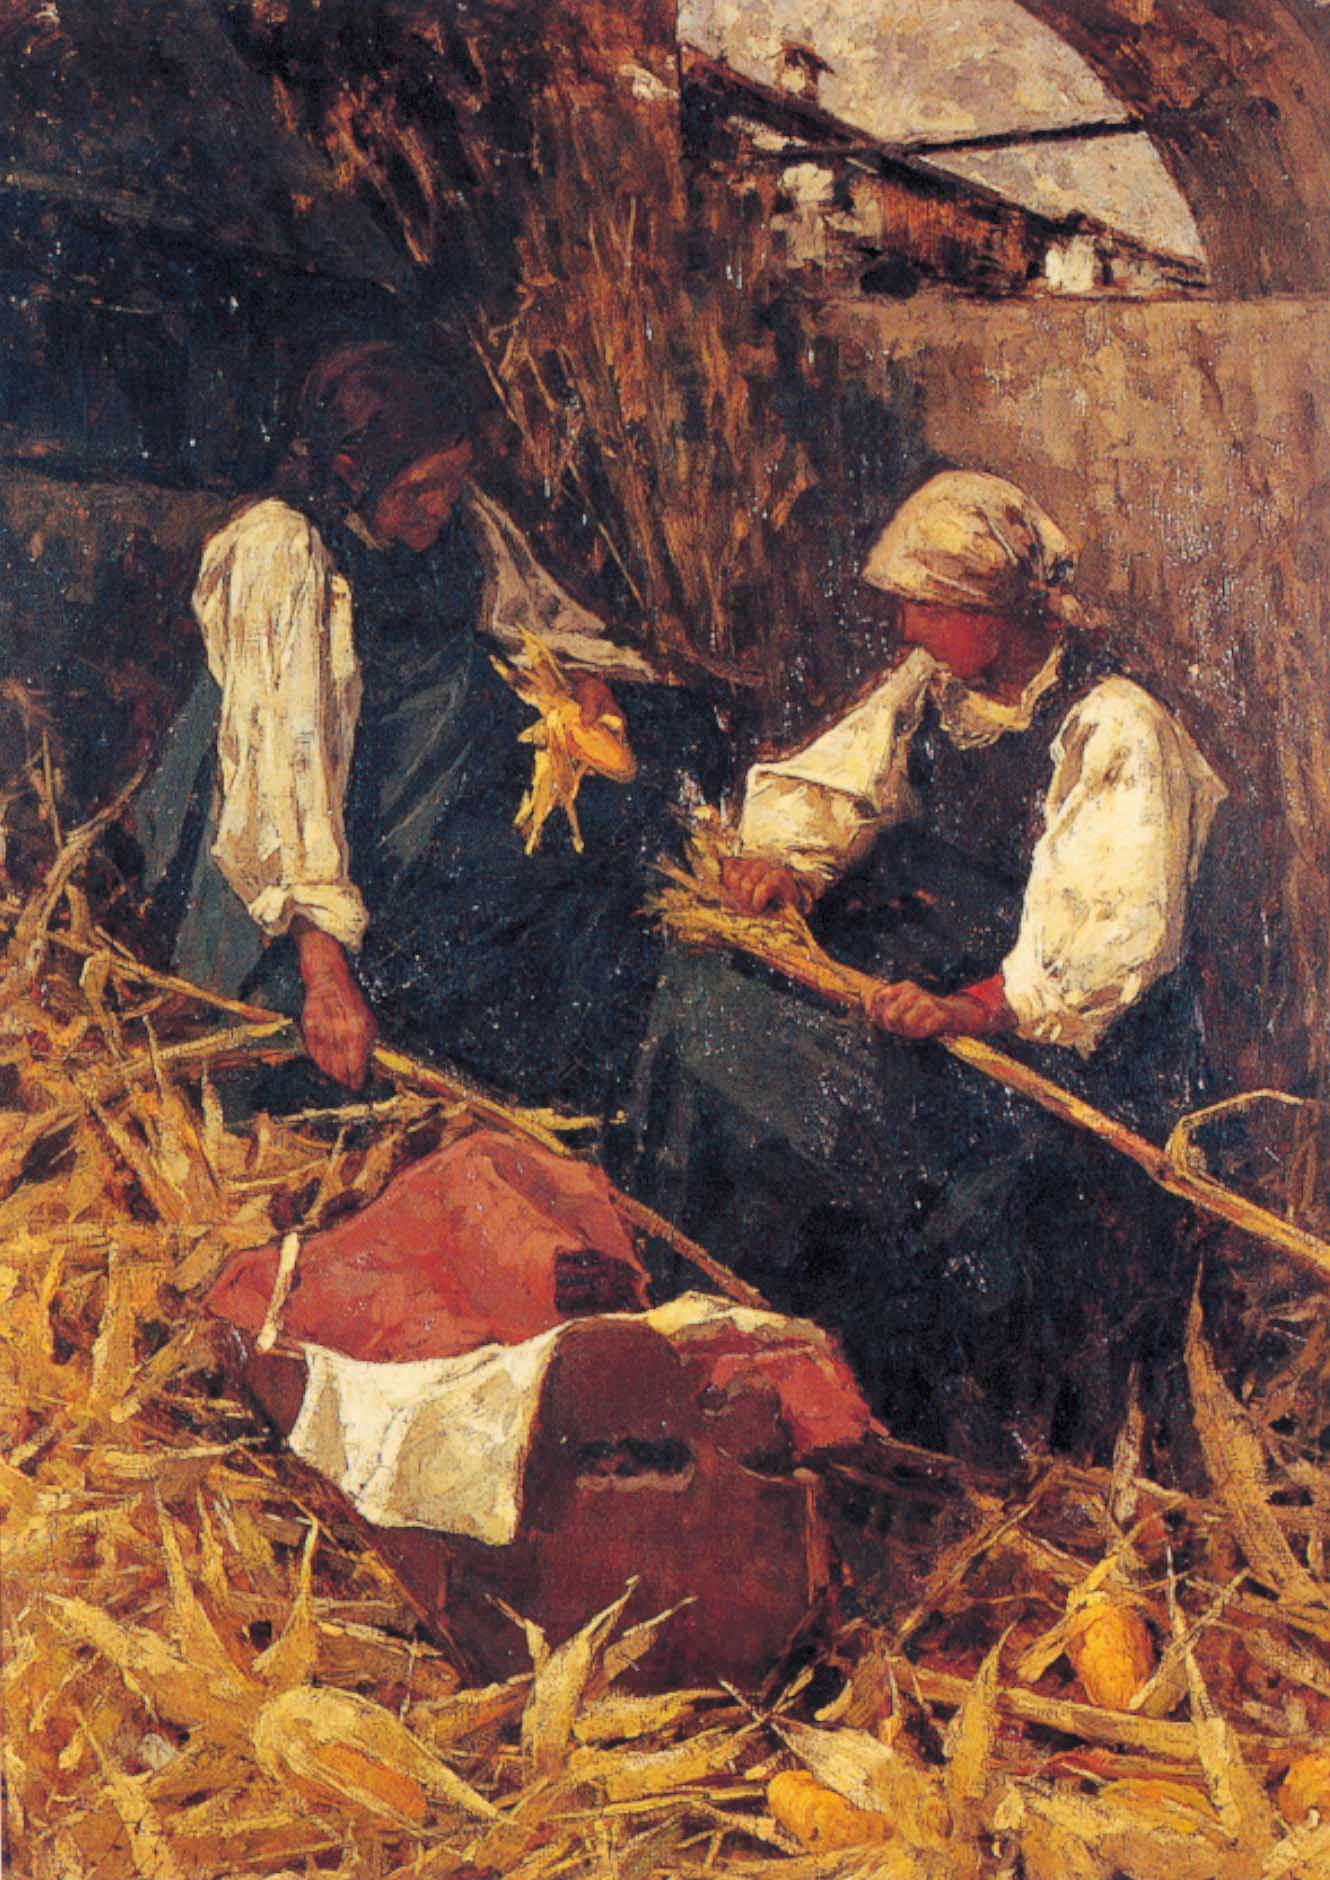 """Le spannocchiatrici"",1887-89 circa"